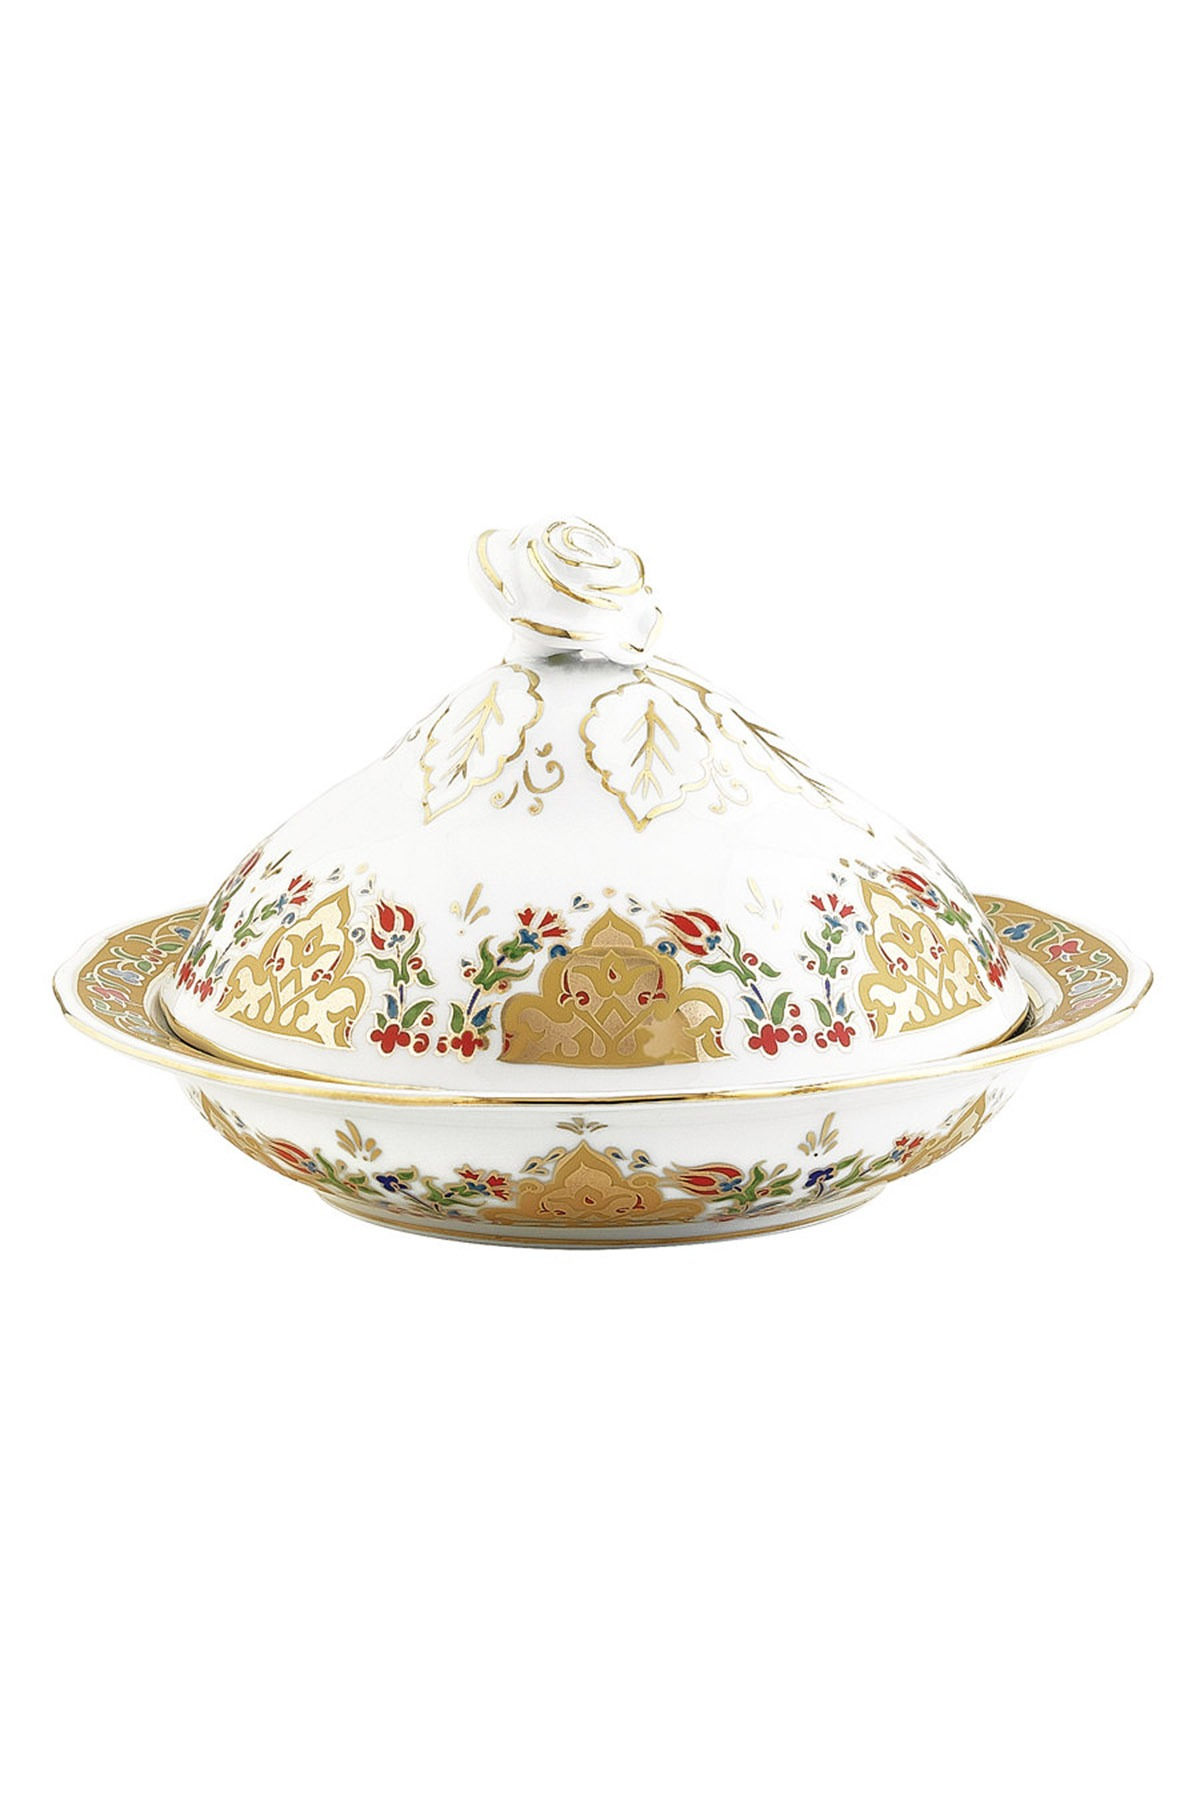 Kütahya Porselen - Kütahya Porselen Sultan Şekerlik 20 Cm Dekor No:412